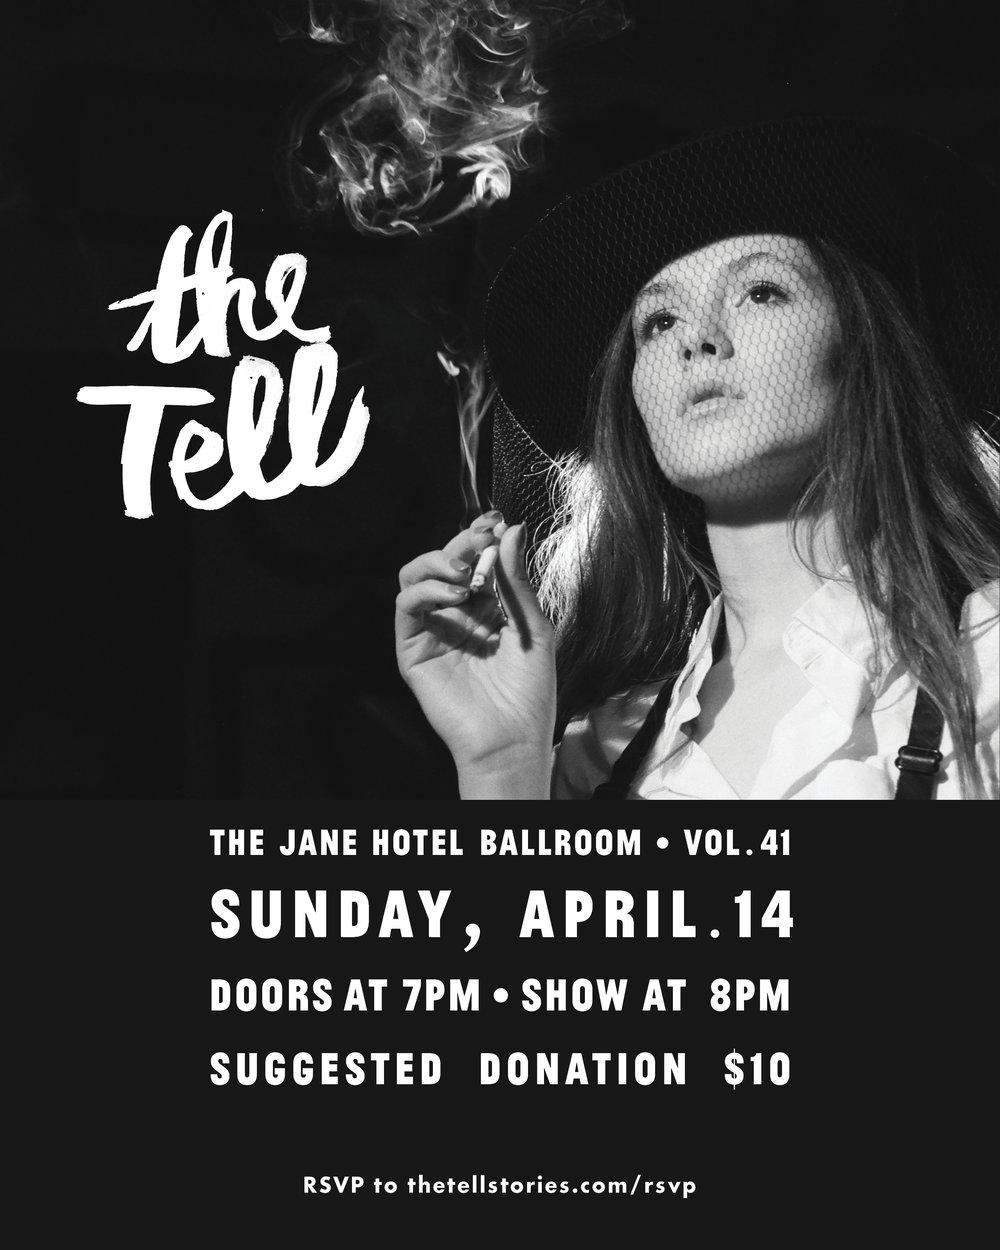 The-Tell-Poster-2019-vol41.jpg